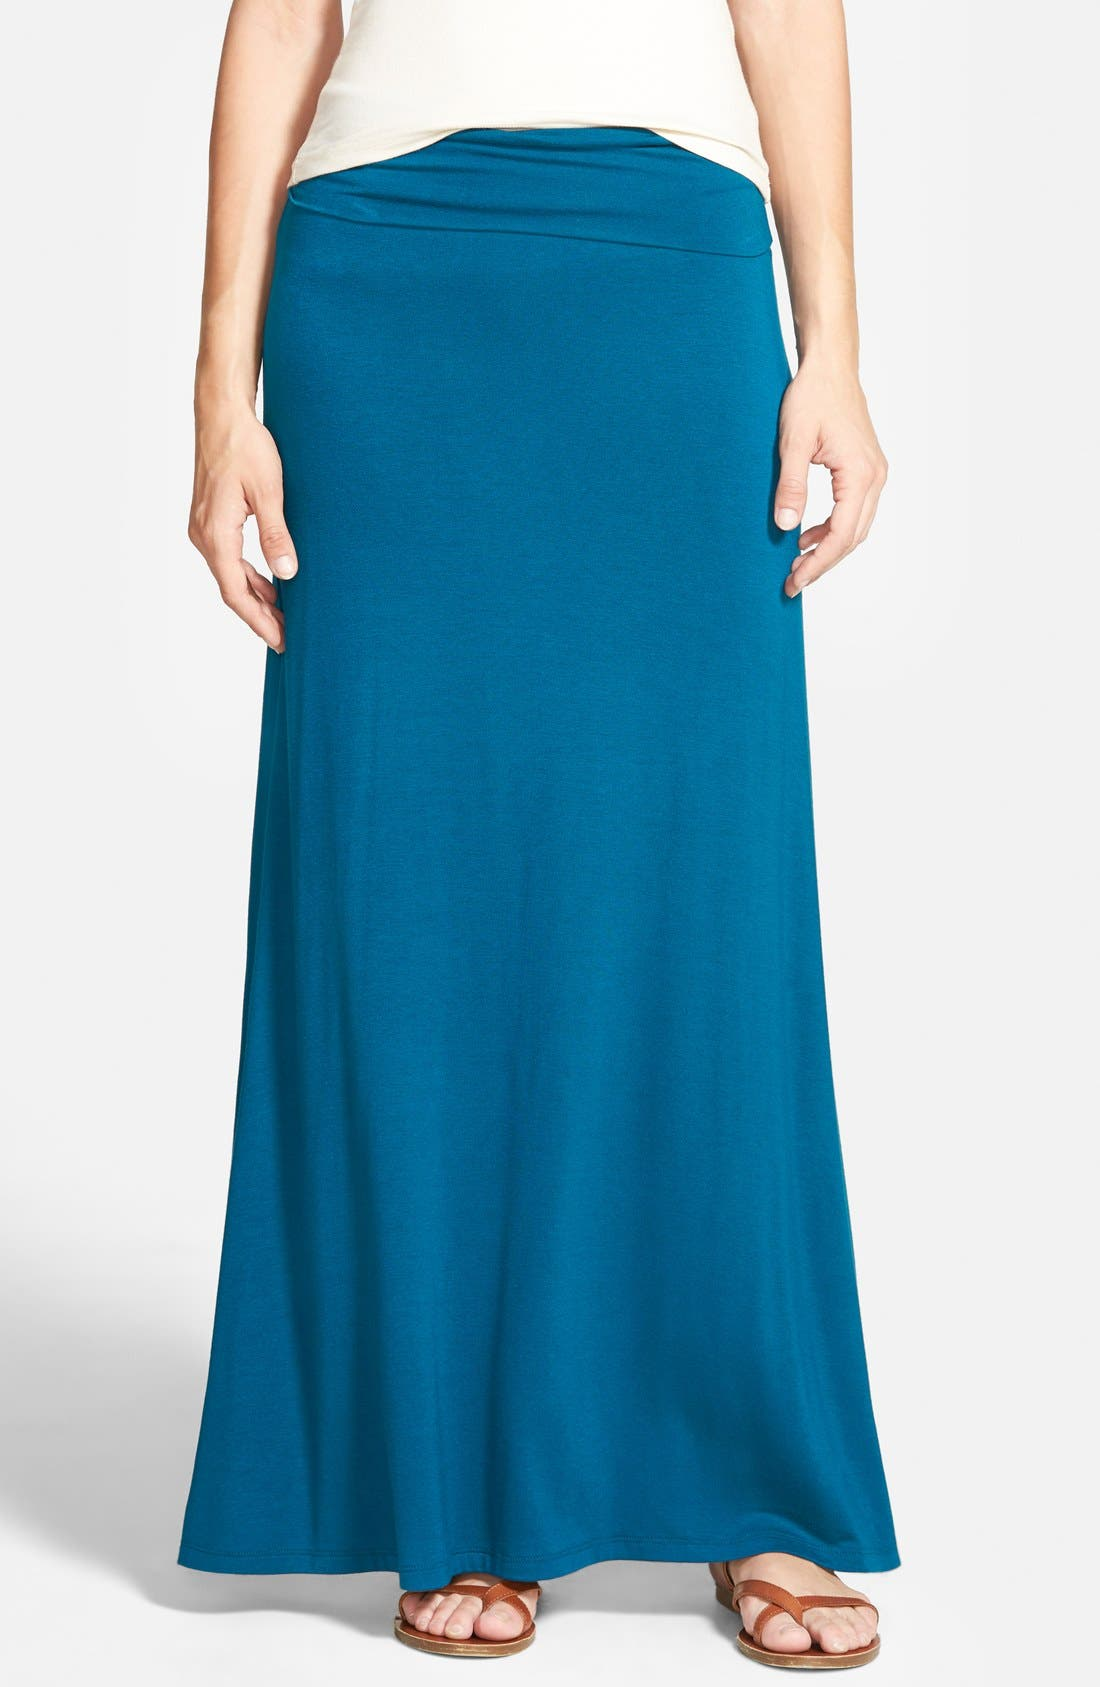 Alternate Image 1 Selected - Lily White Half-Sheer Maxi Skirt (Juniors)